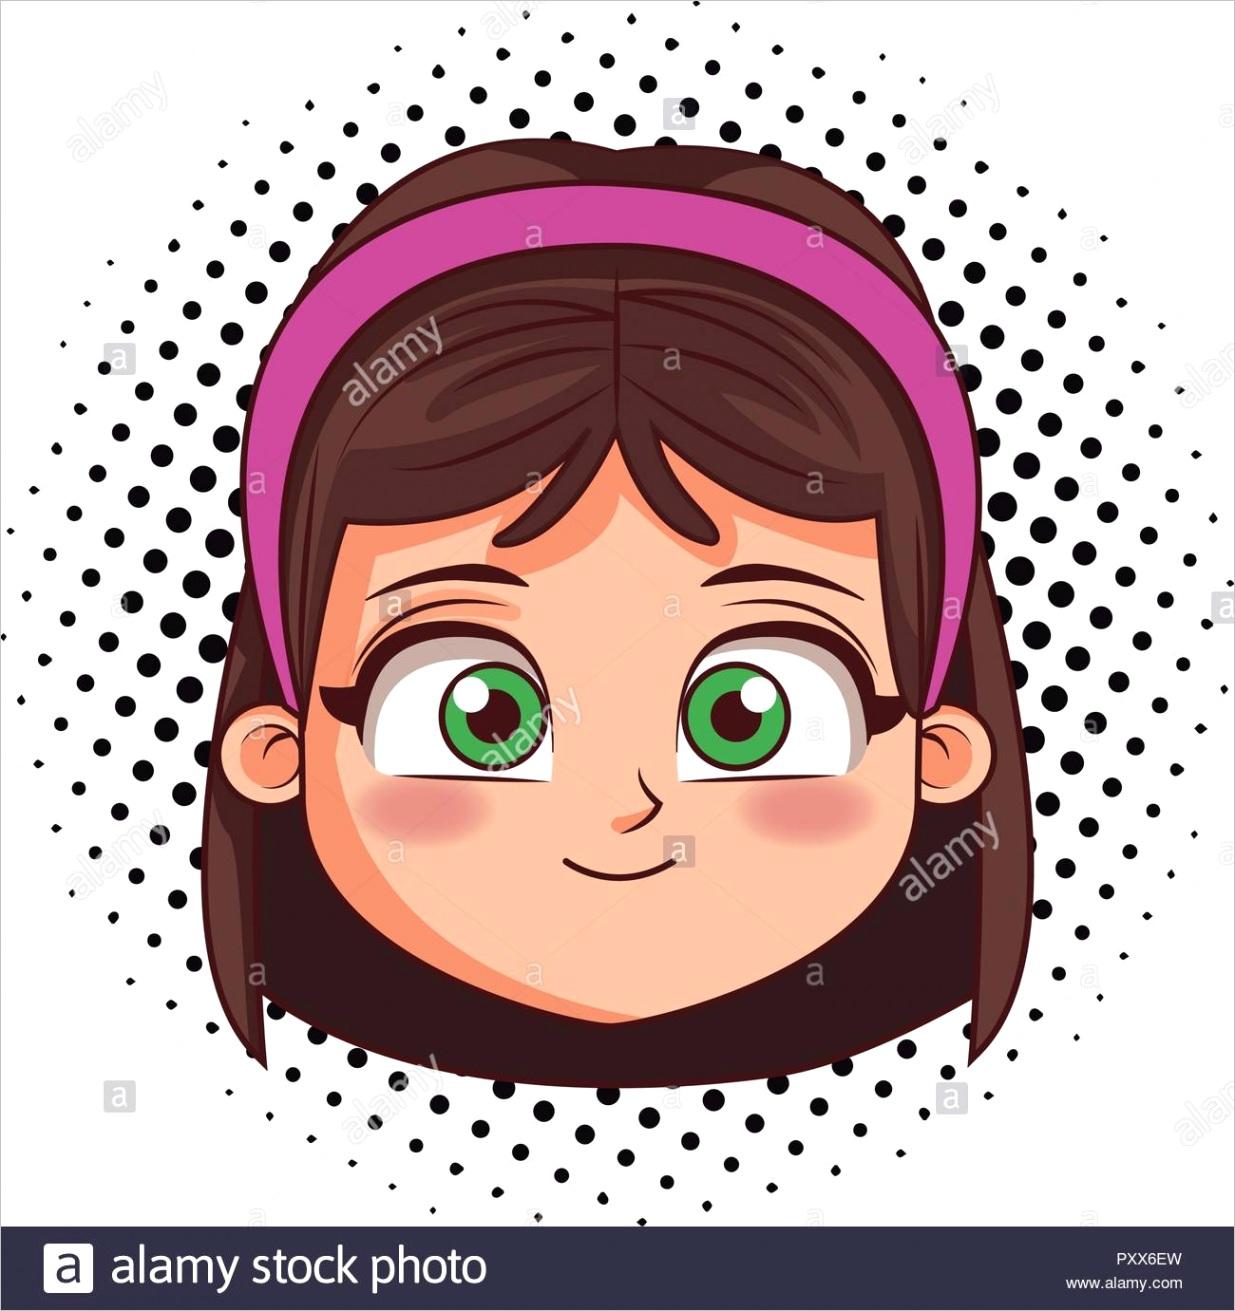 cute girl face image ml